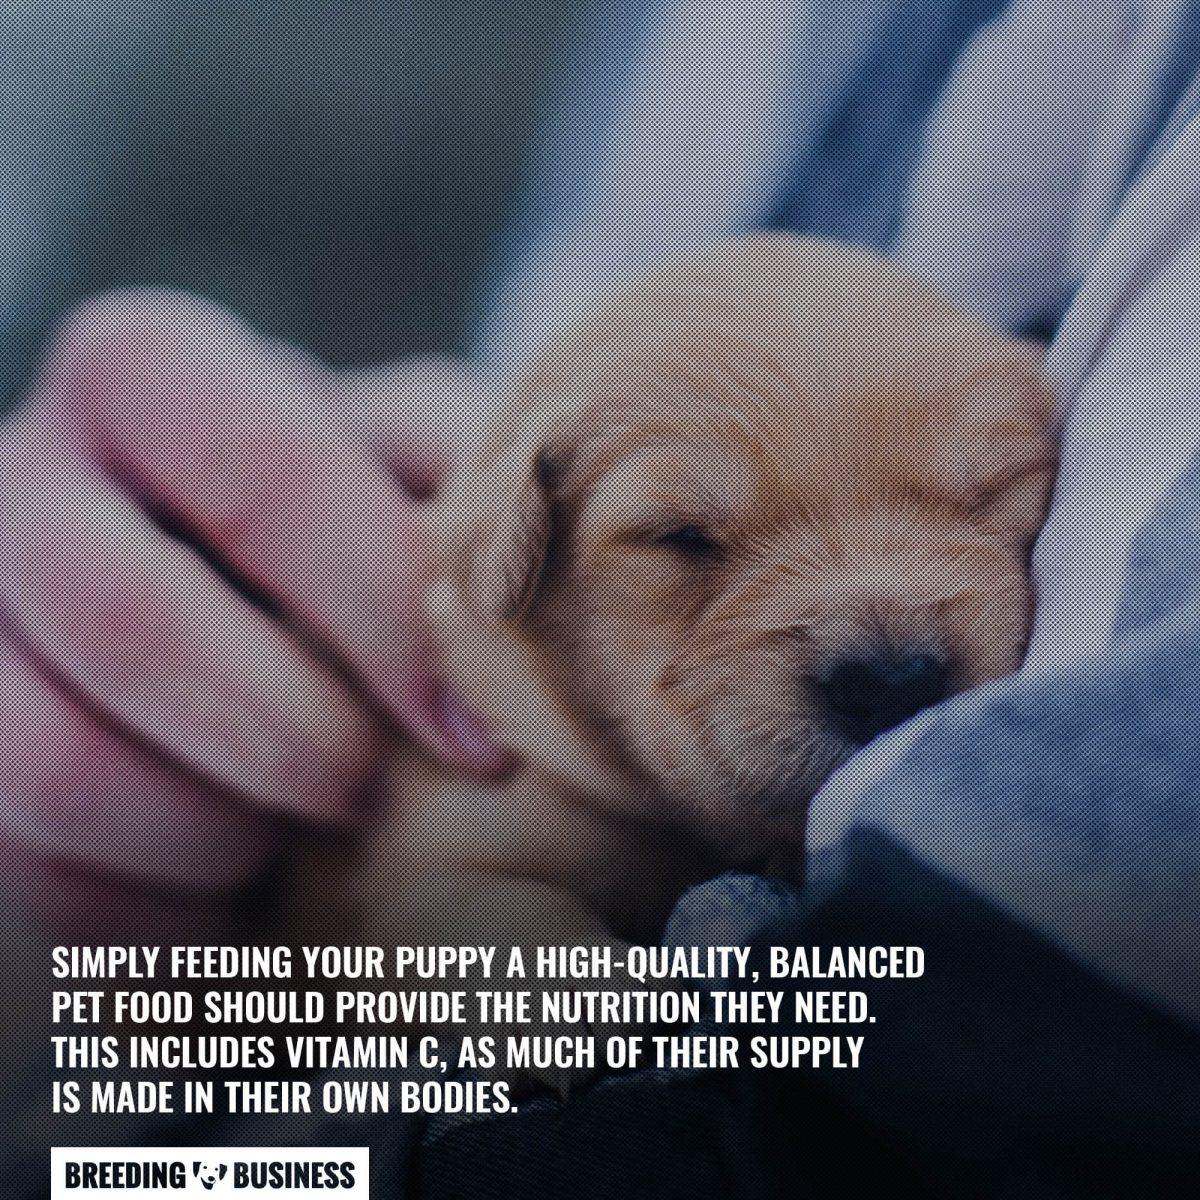 vitamin c for puppies